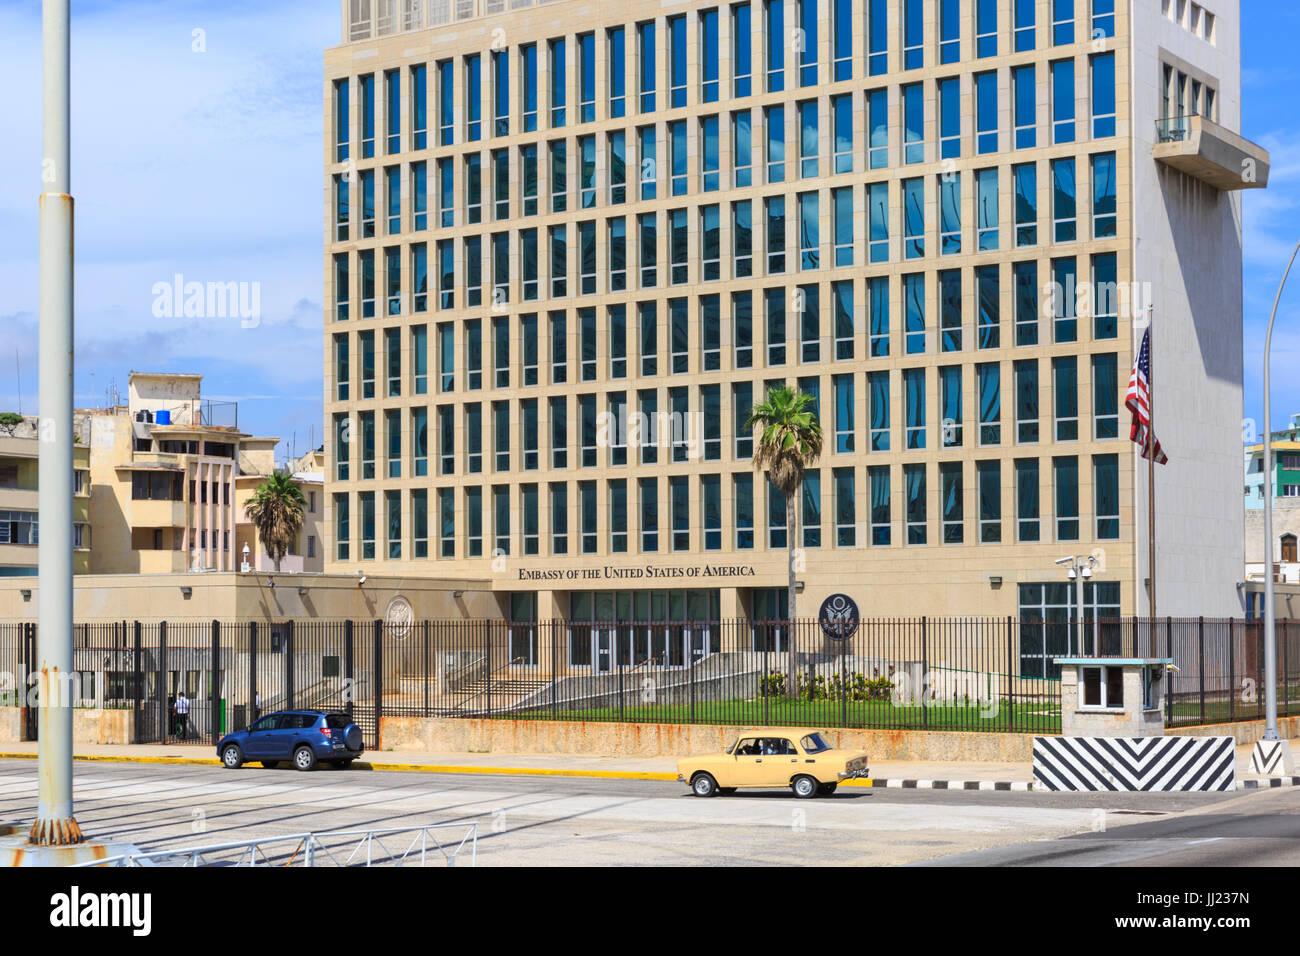 american-embassy-us-embassy-embassy-of-the-united-states-of-america-JJ237N.jpg